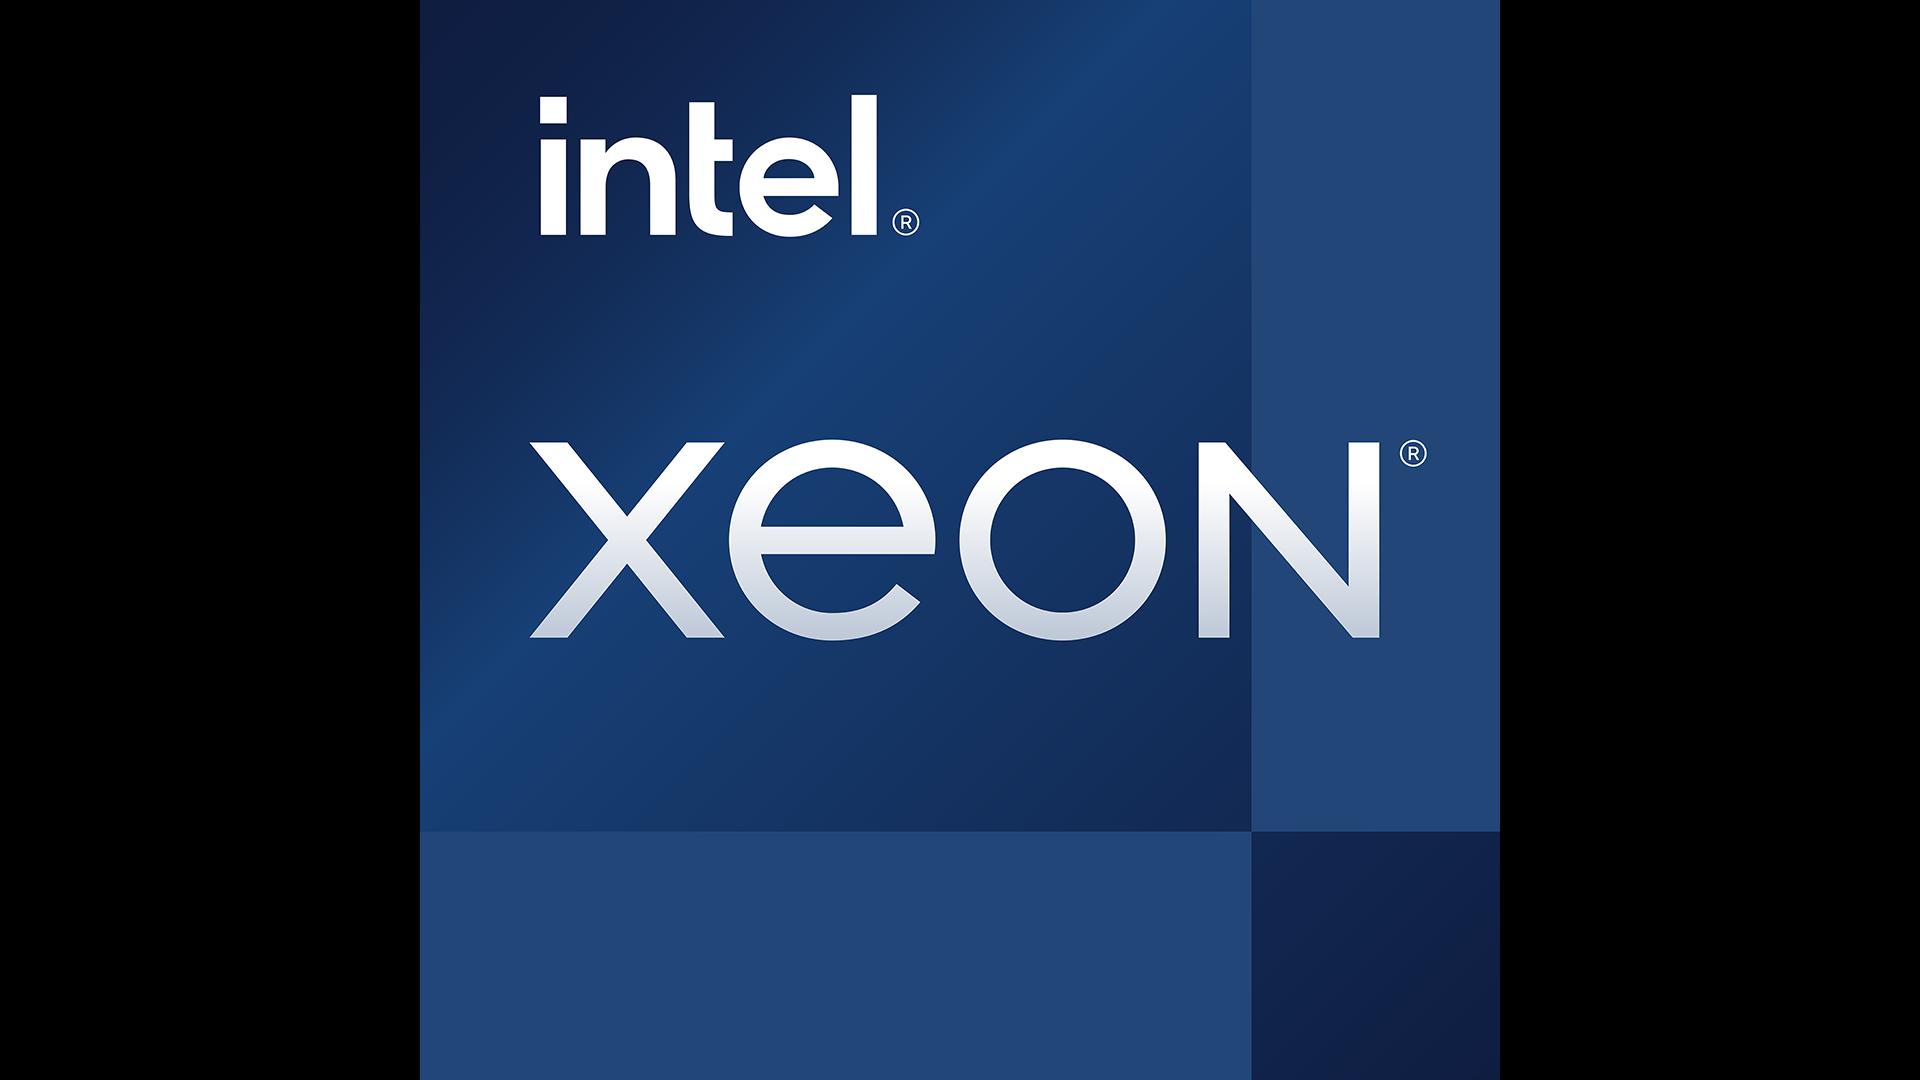 xeon-badge.png.rendition.intel.web.1920.1080